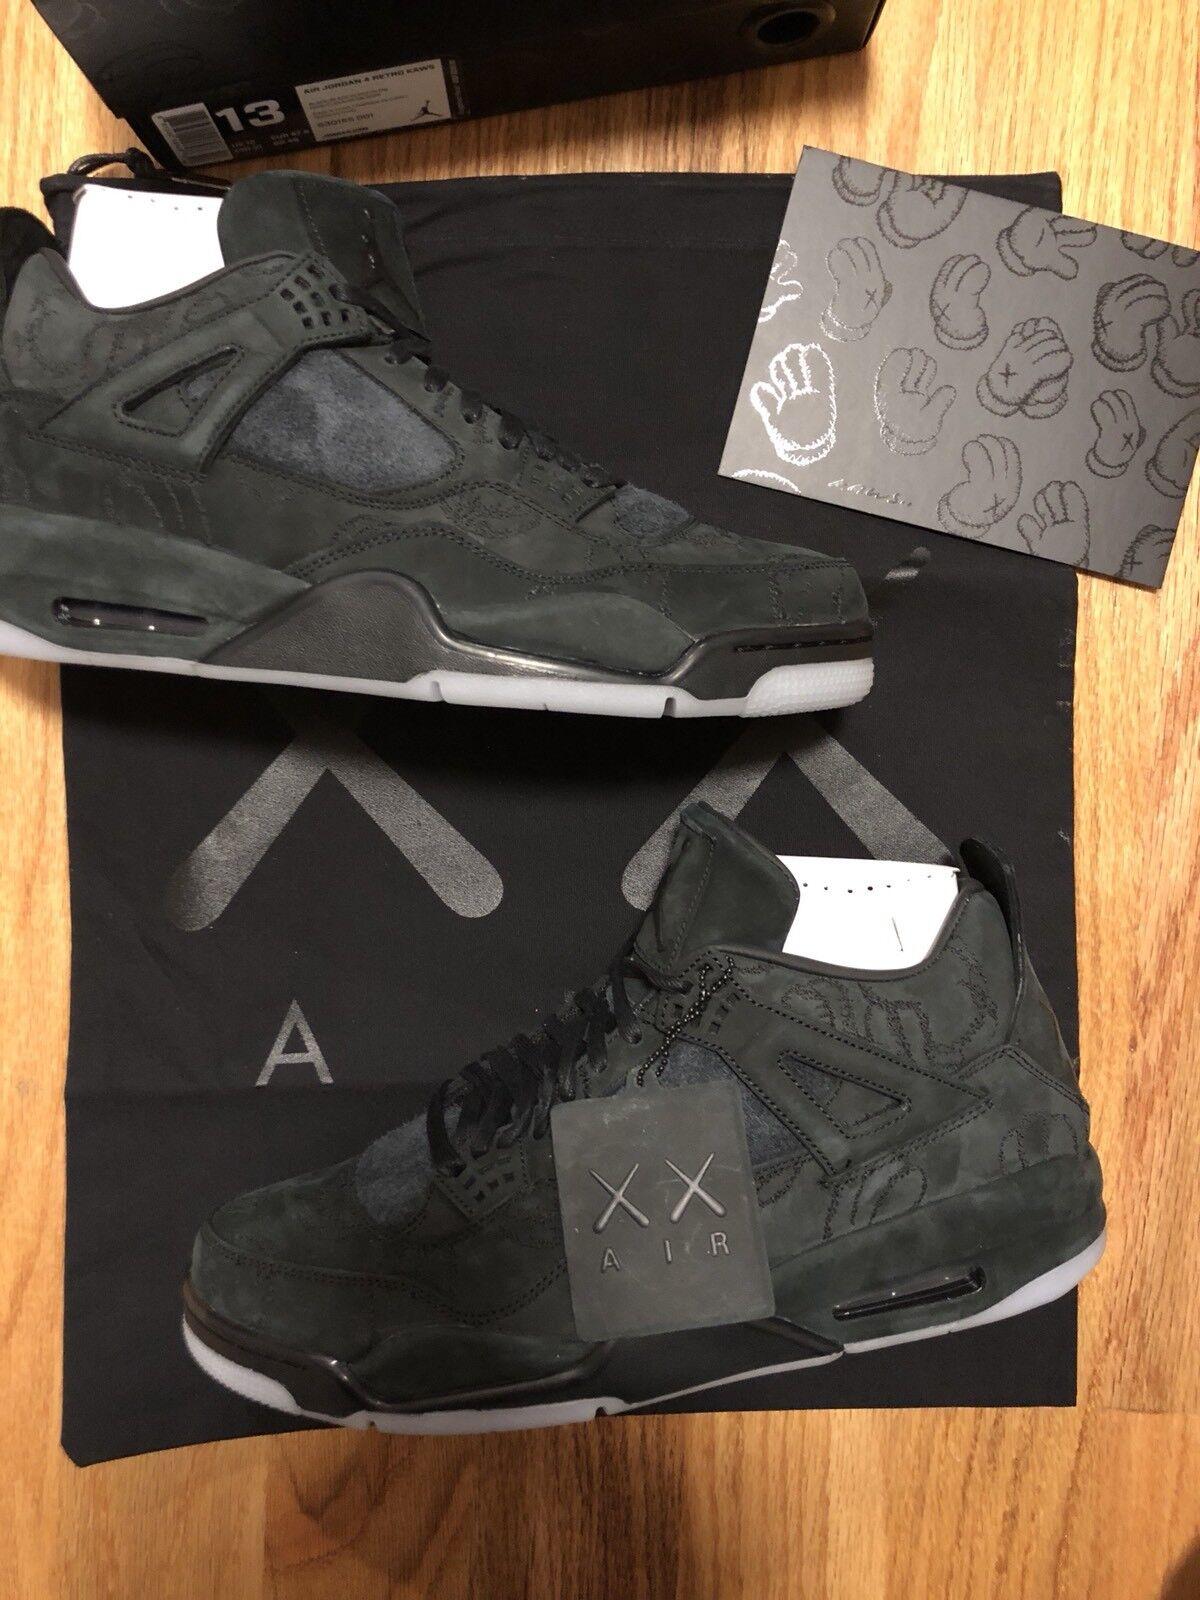 Limited Edition -- KAWS x Air Jordan 4 -- Size 13